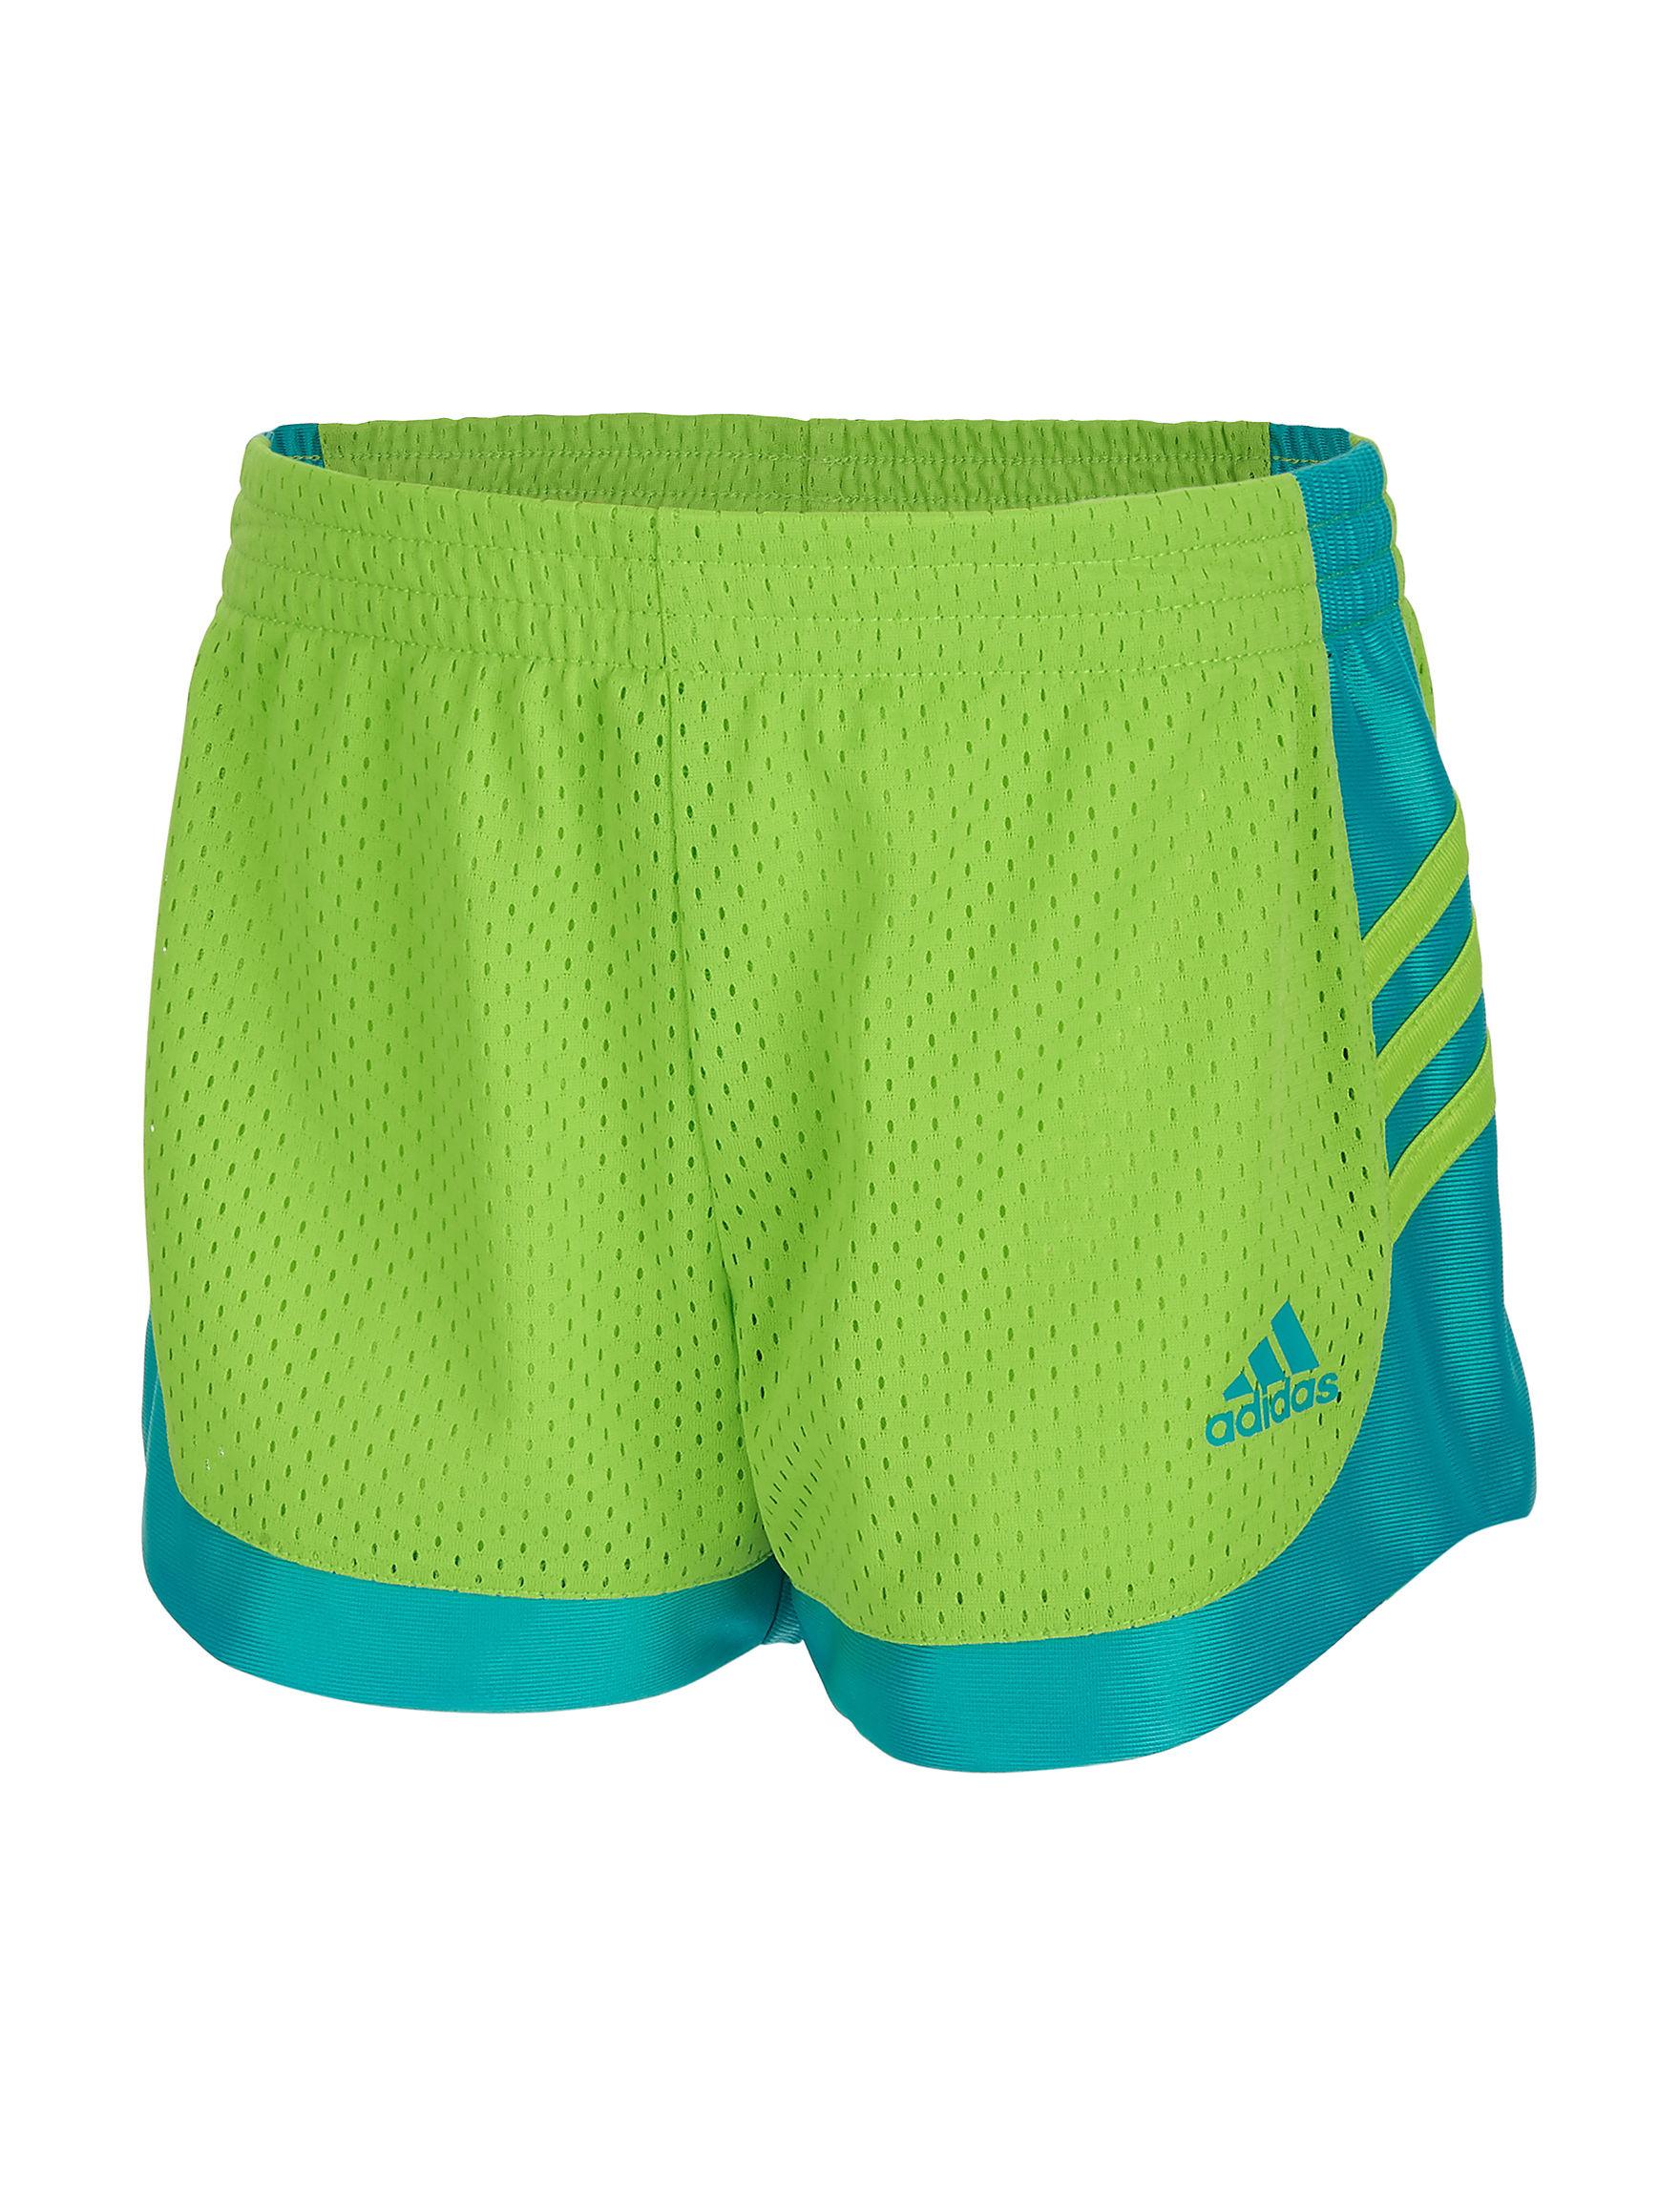 Adidas Light Green Stretch